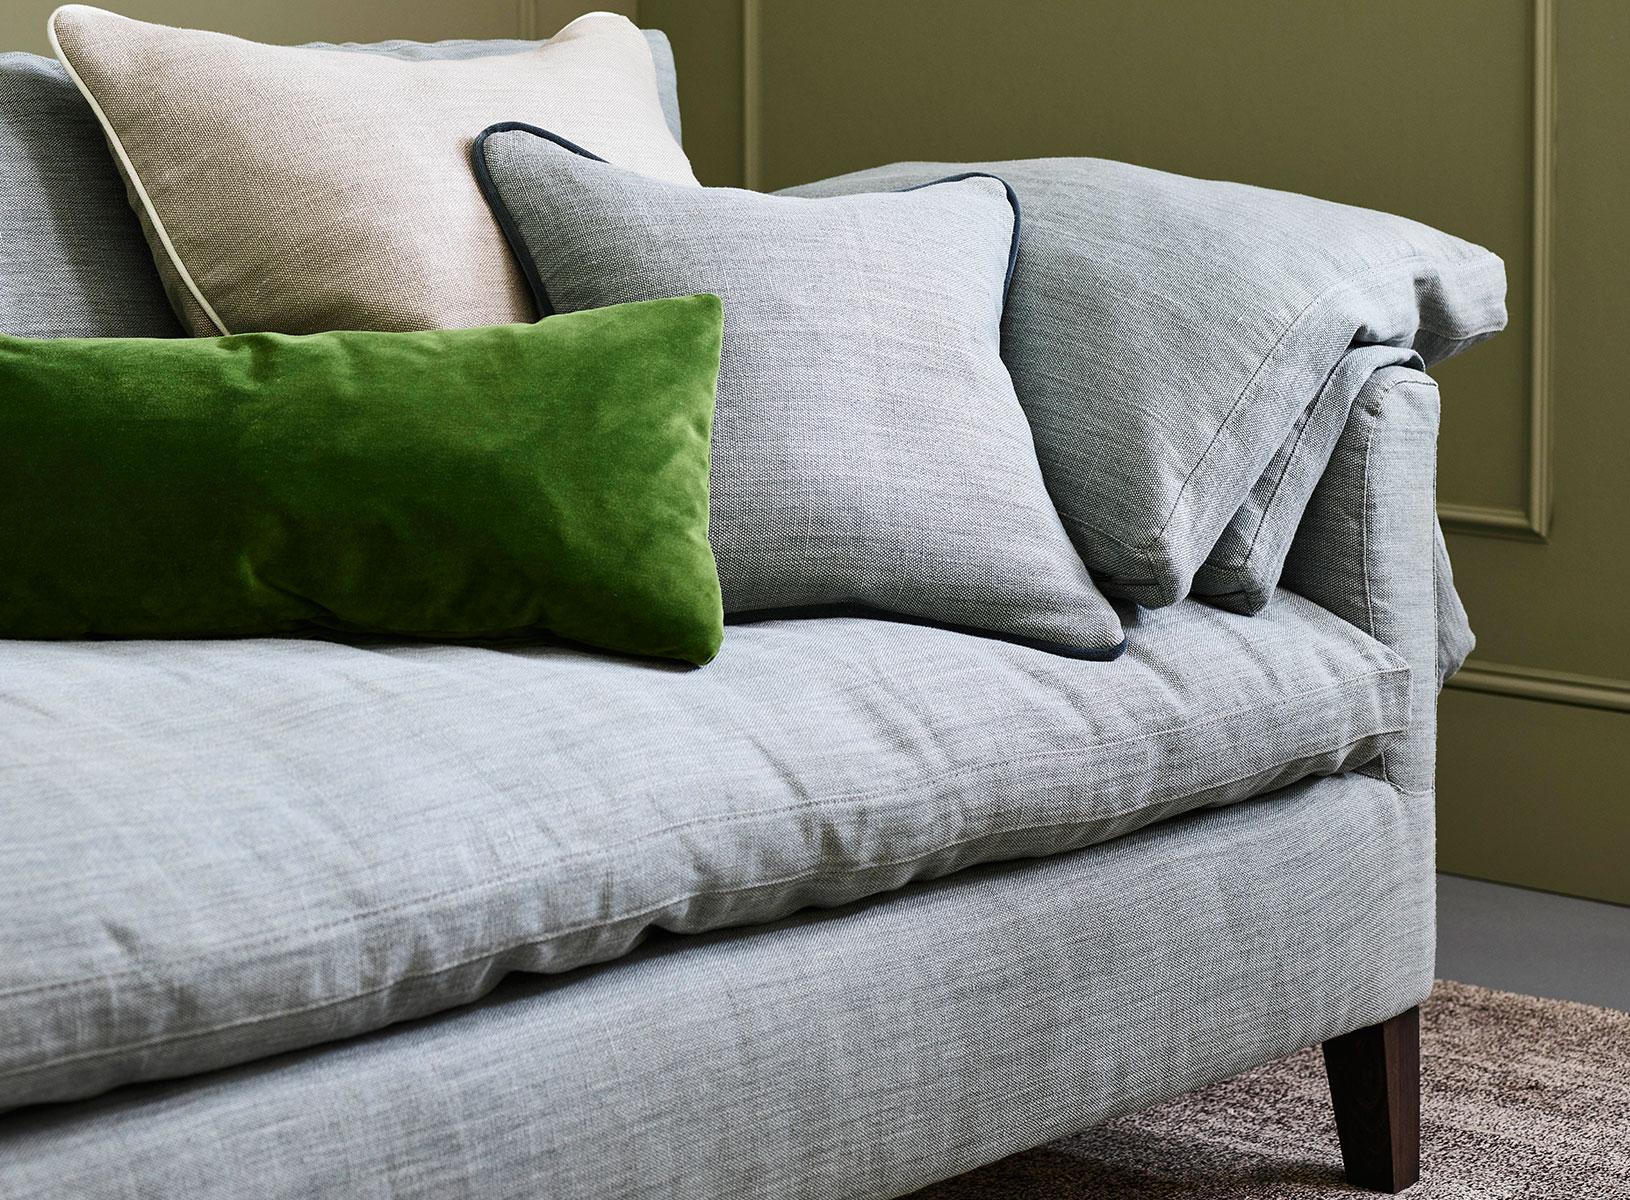 Jude sofa with cushions